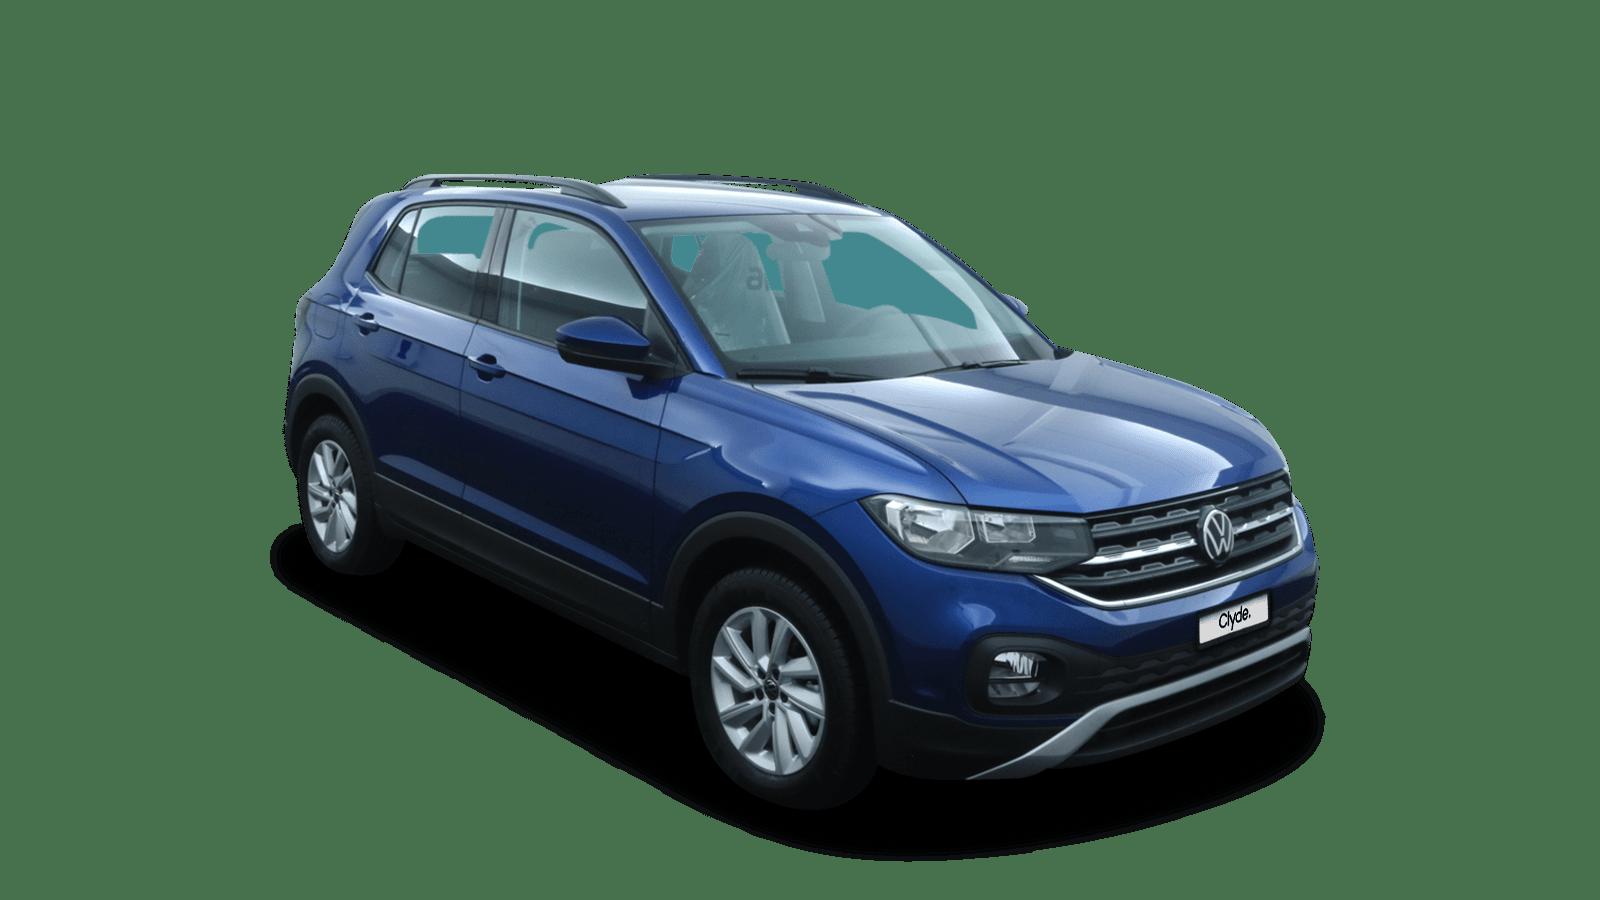 VW T-Cross Blau front - Clyde Auto-Abo